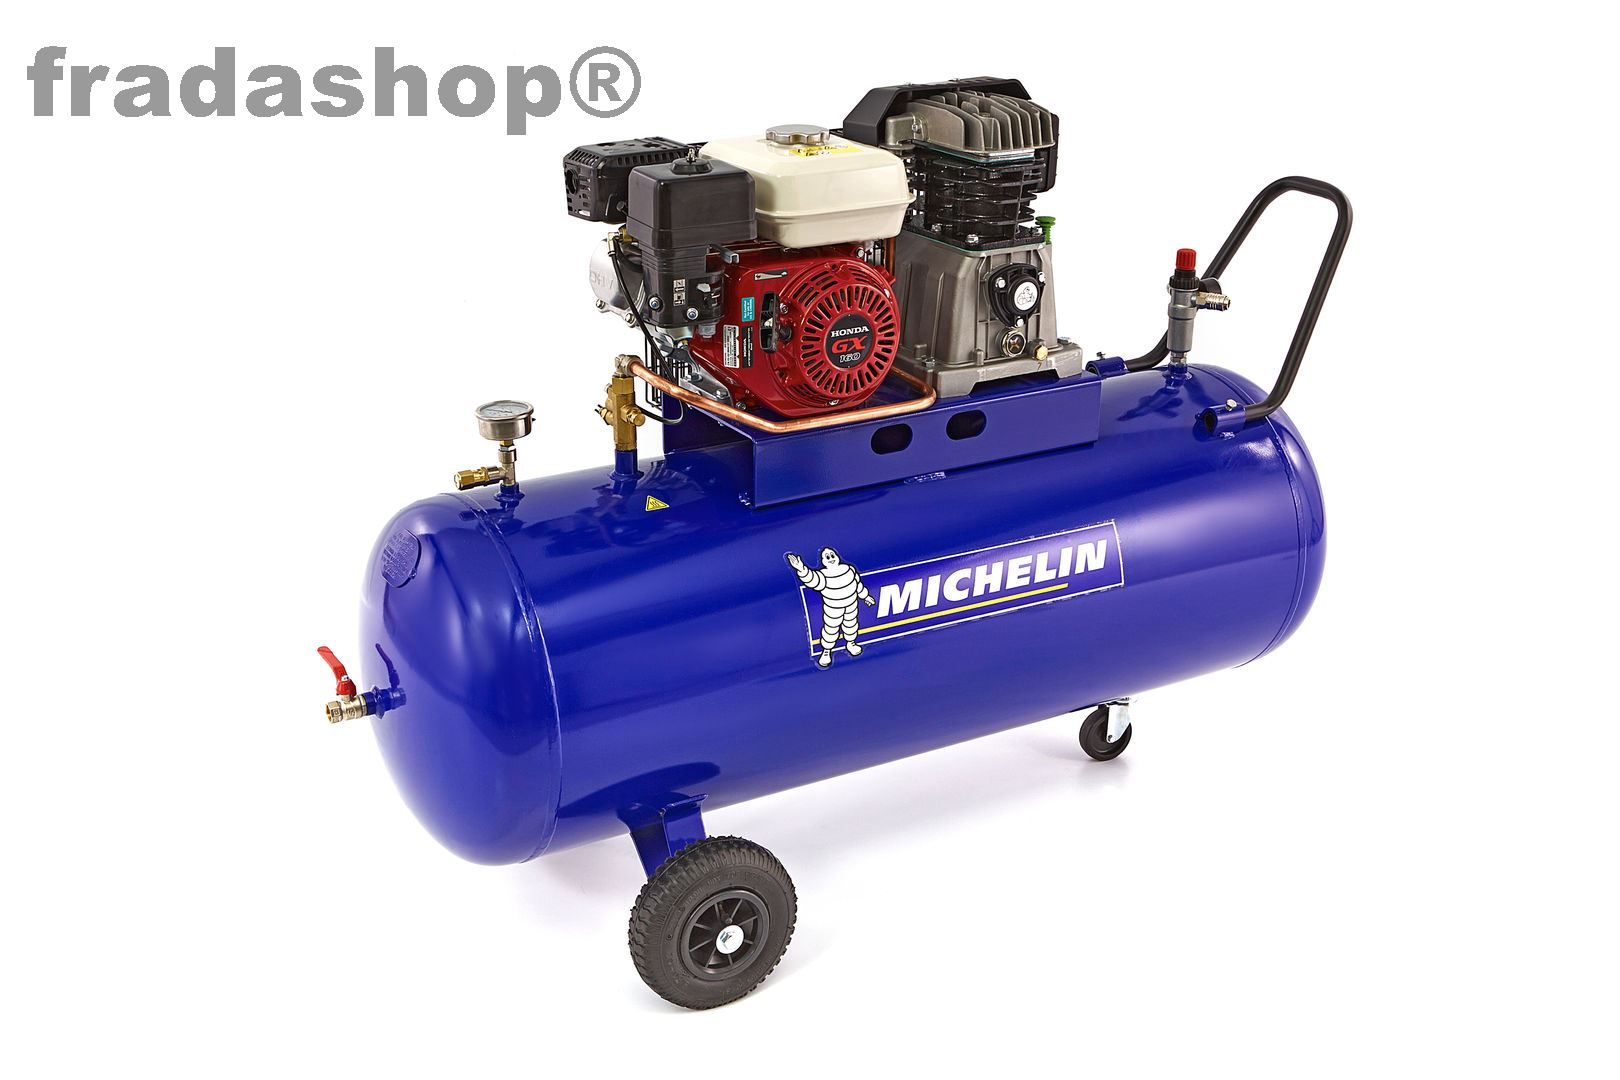 benzinbetriebener kompressor michelin 200 liter 5 5 hp. Black Bedroom Furniture Sets. Home Design Ideas